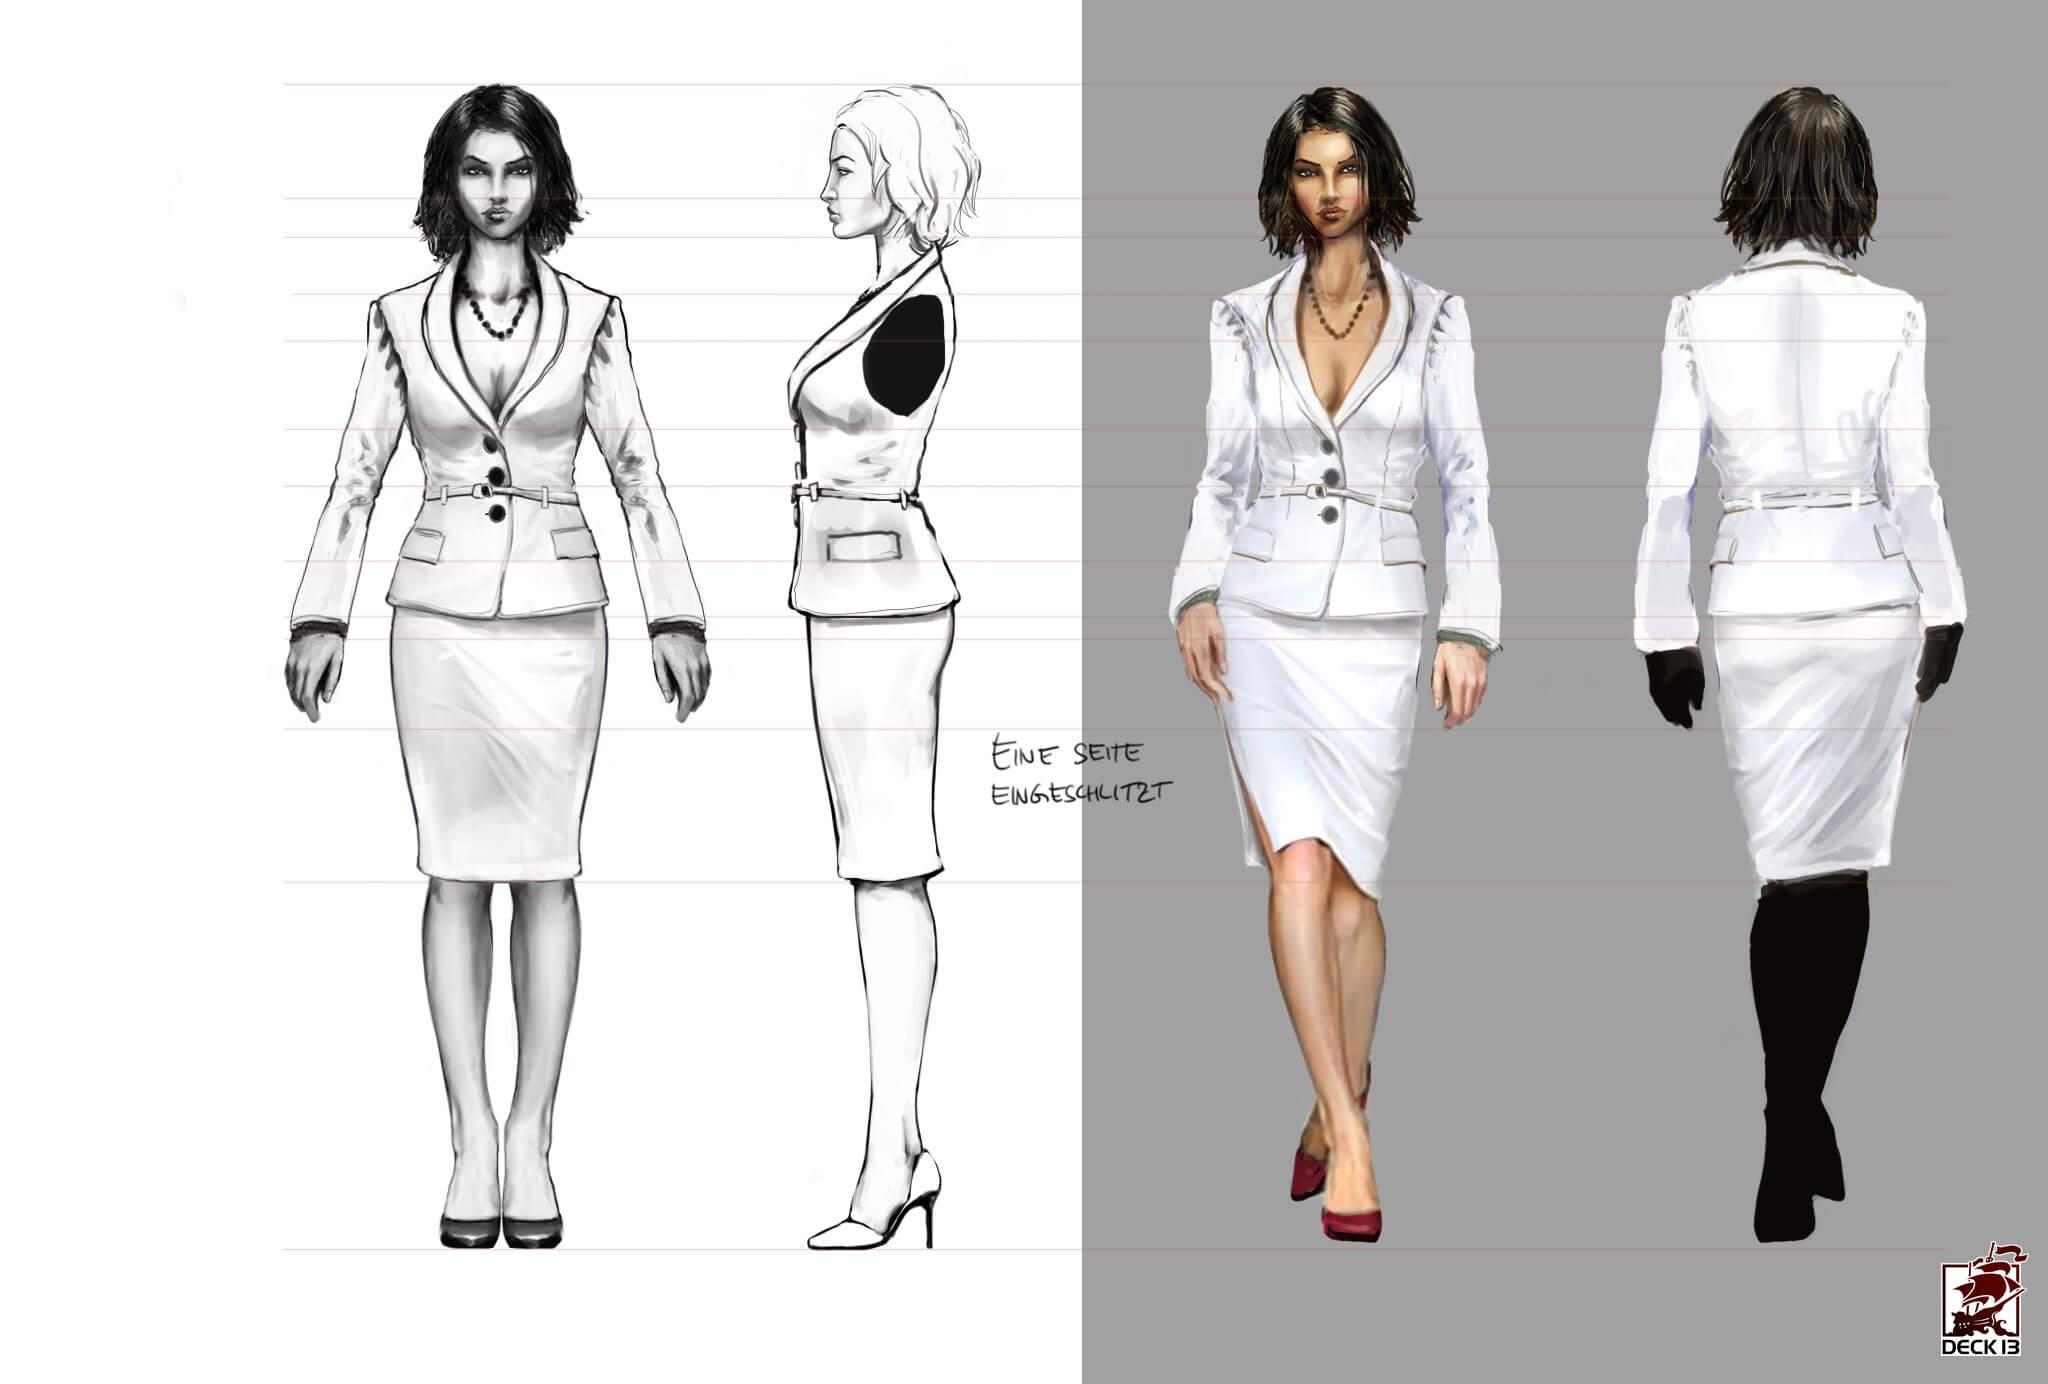 strain-deck13-character-concept-art-felix-botho-haas-boss1